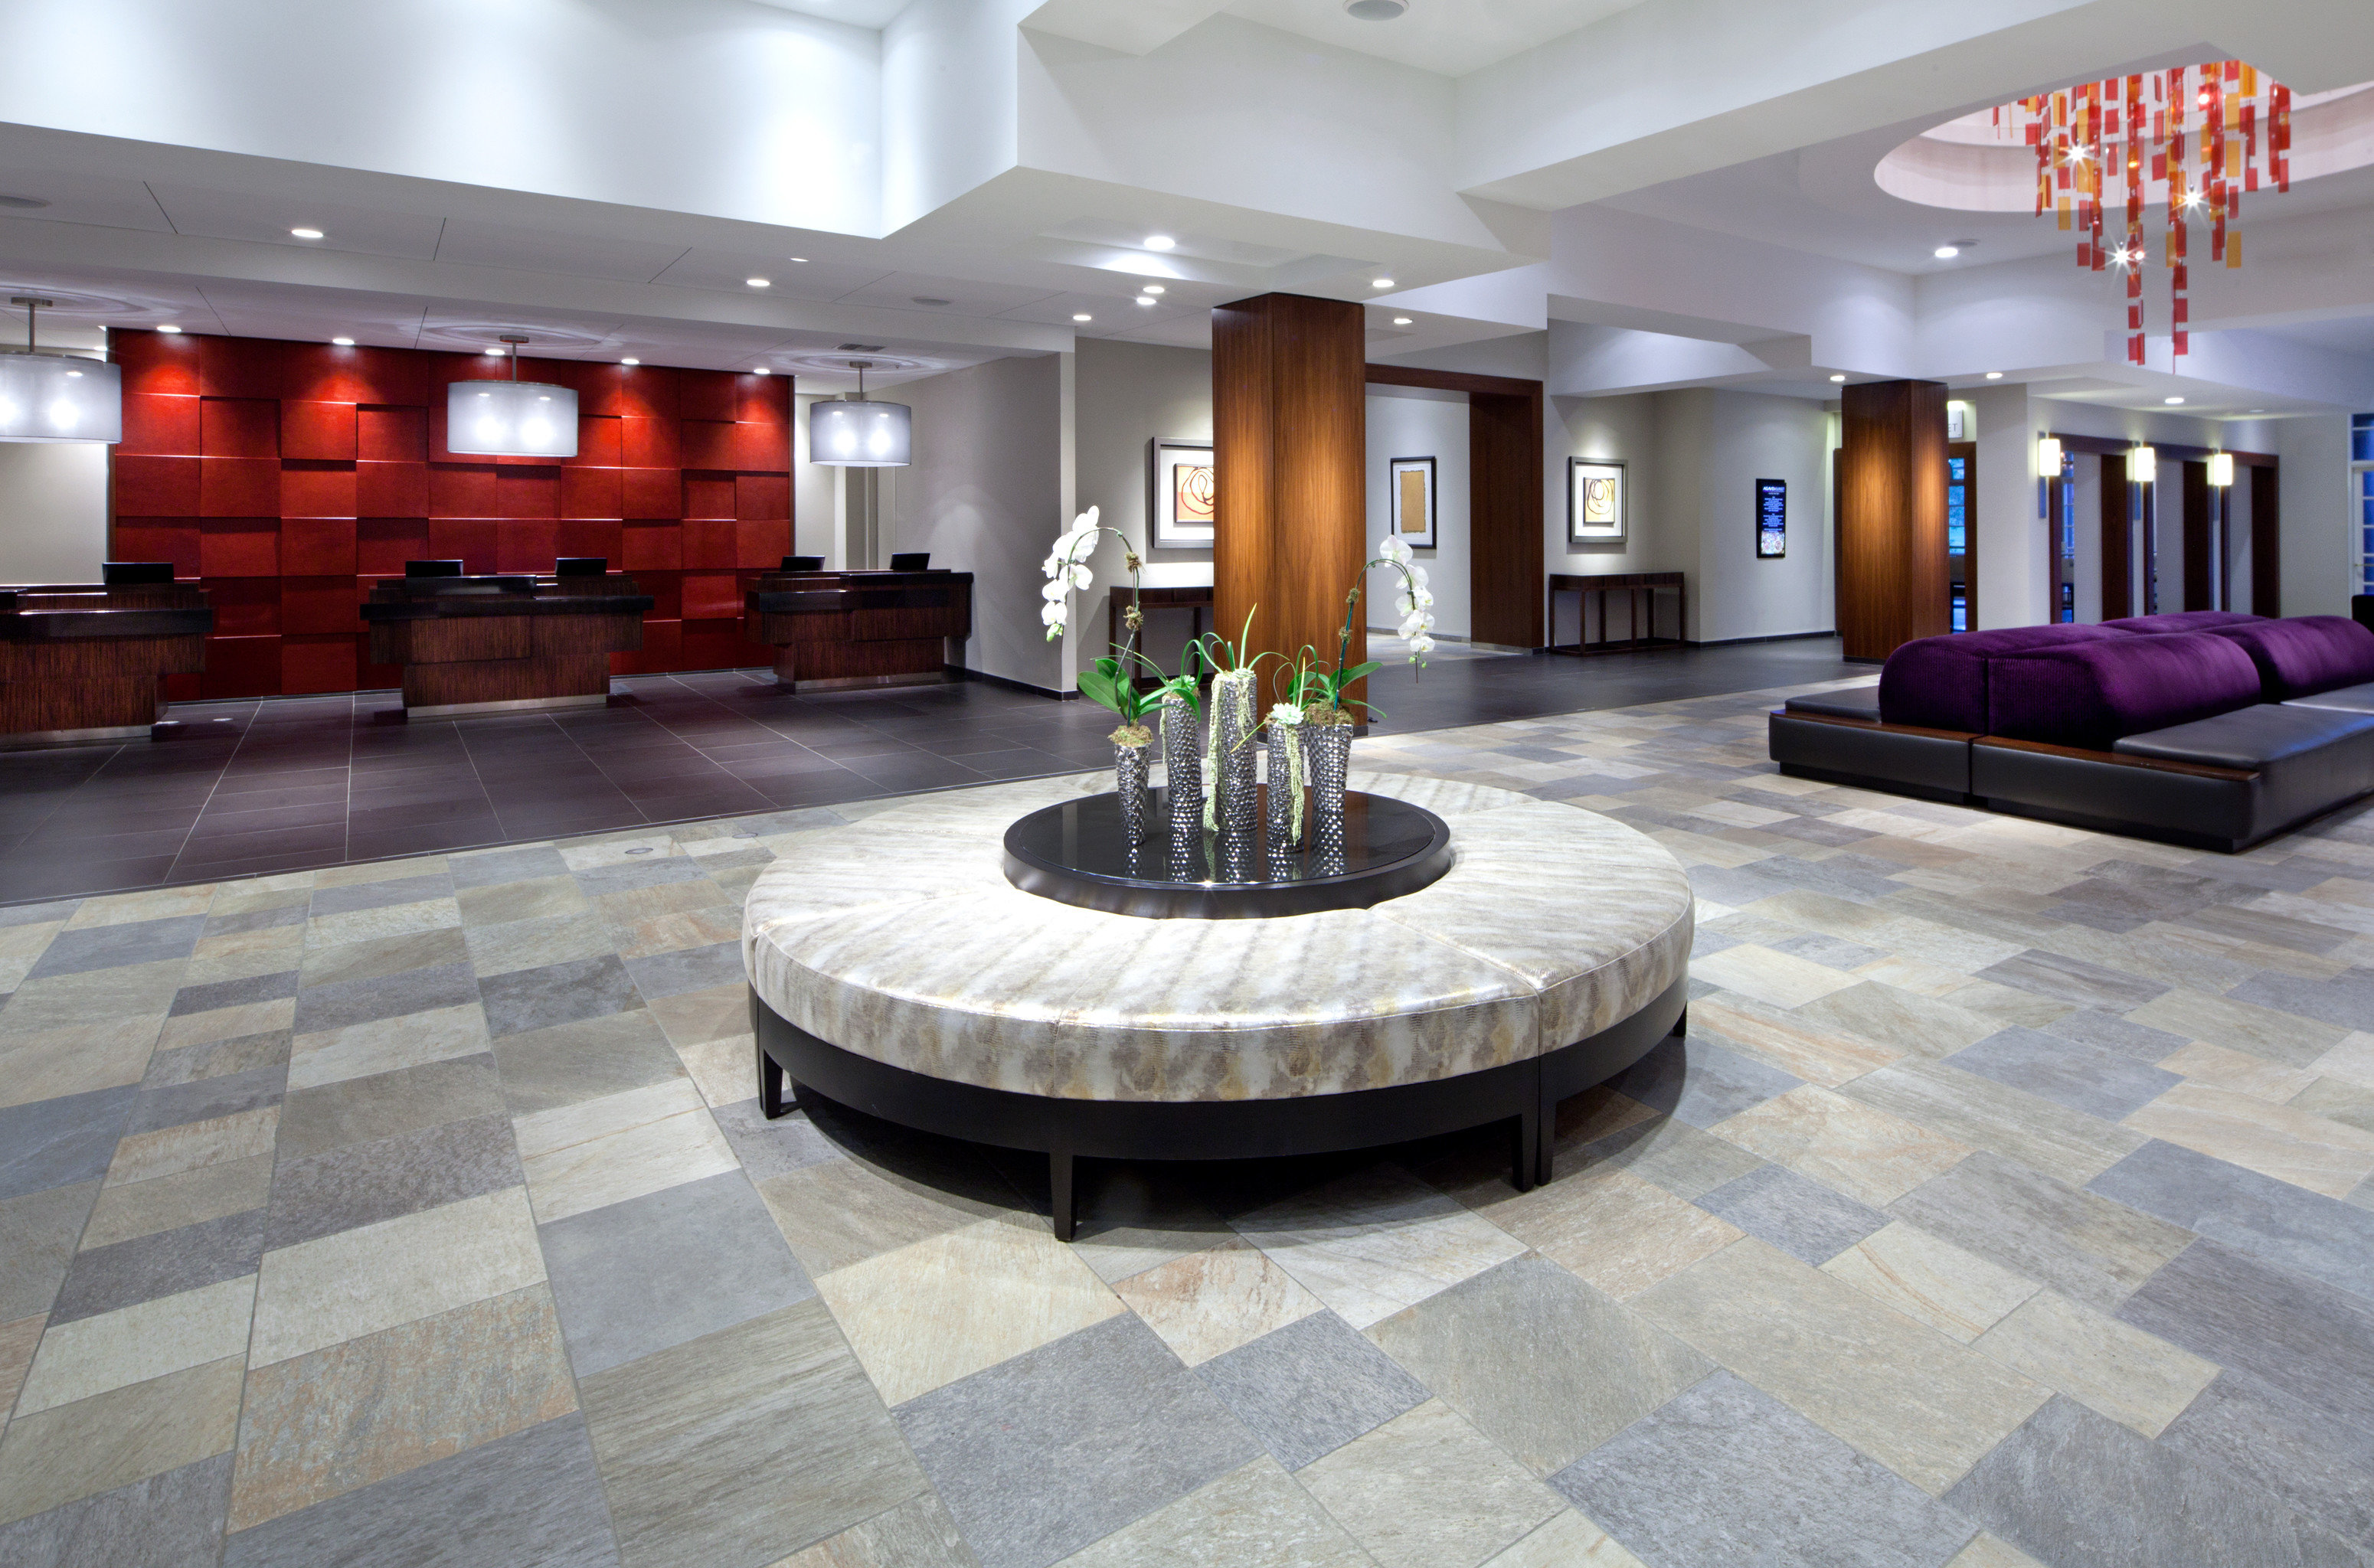 Lobby property flooring hardwood living room home wood flooring mansion stone Island